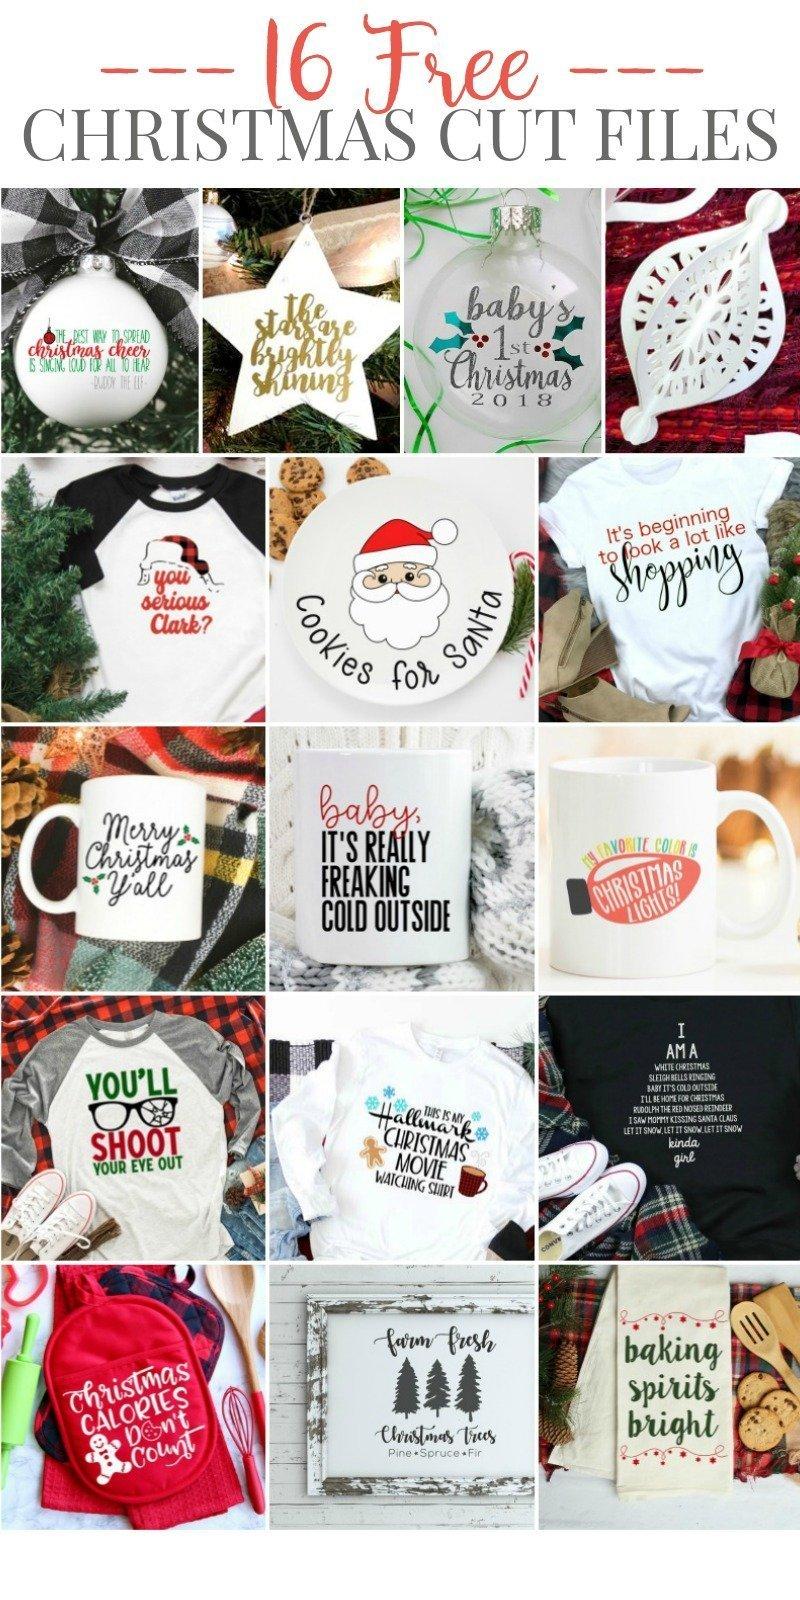 16 Free Christmas Cut Files